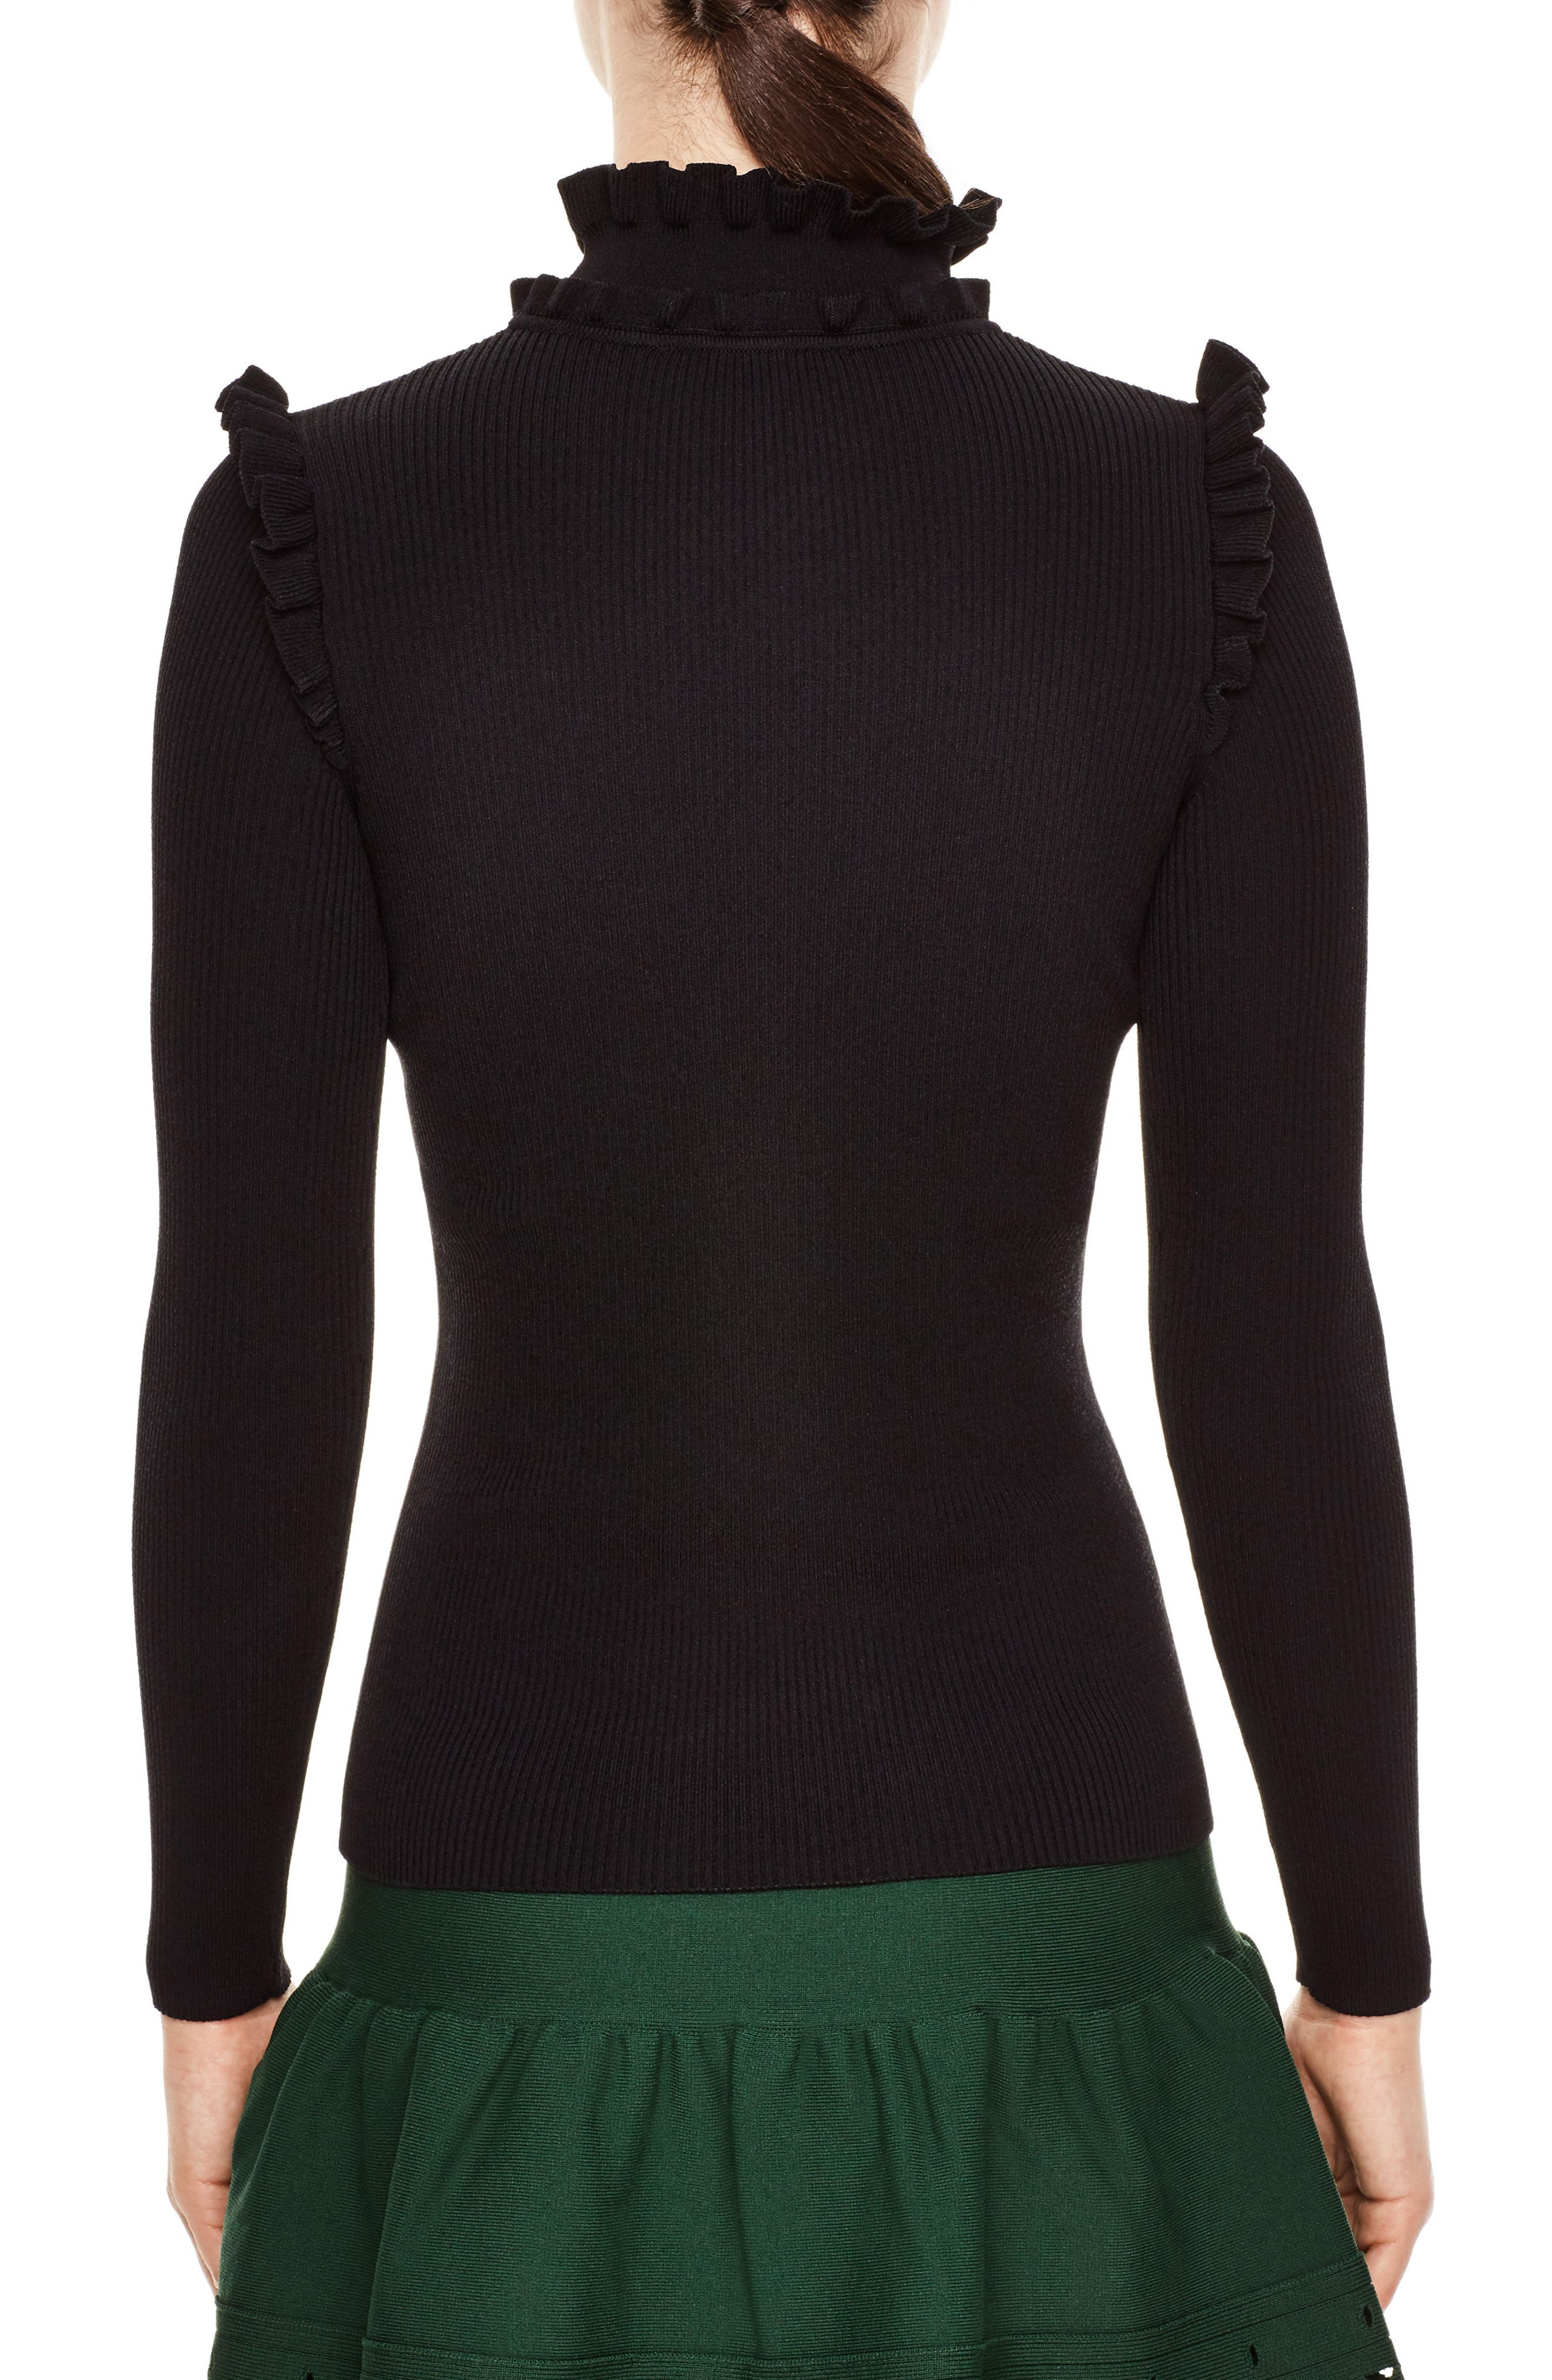 Ruffle Trim Turtleneck Sweater,                             Alternate thumbnail 2, color,                             001